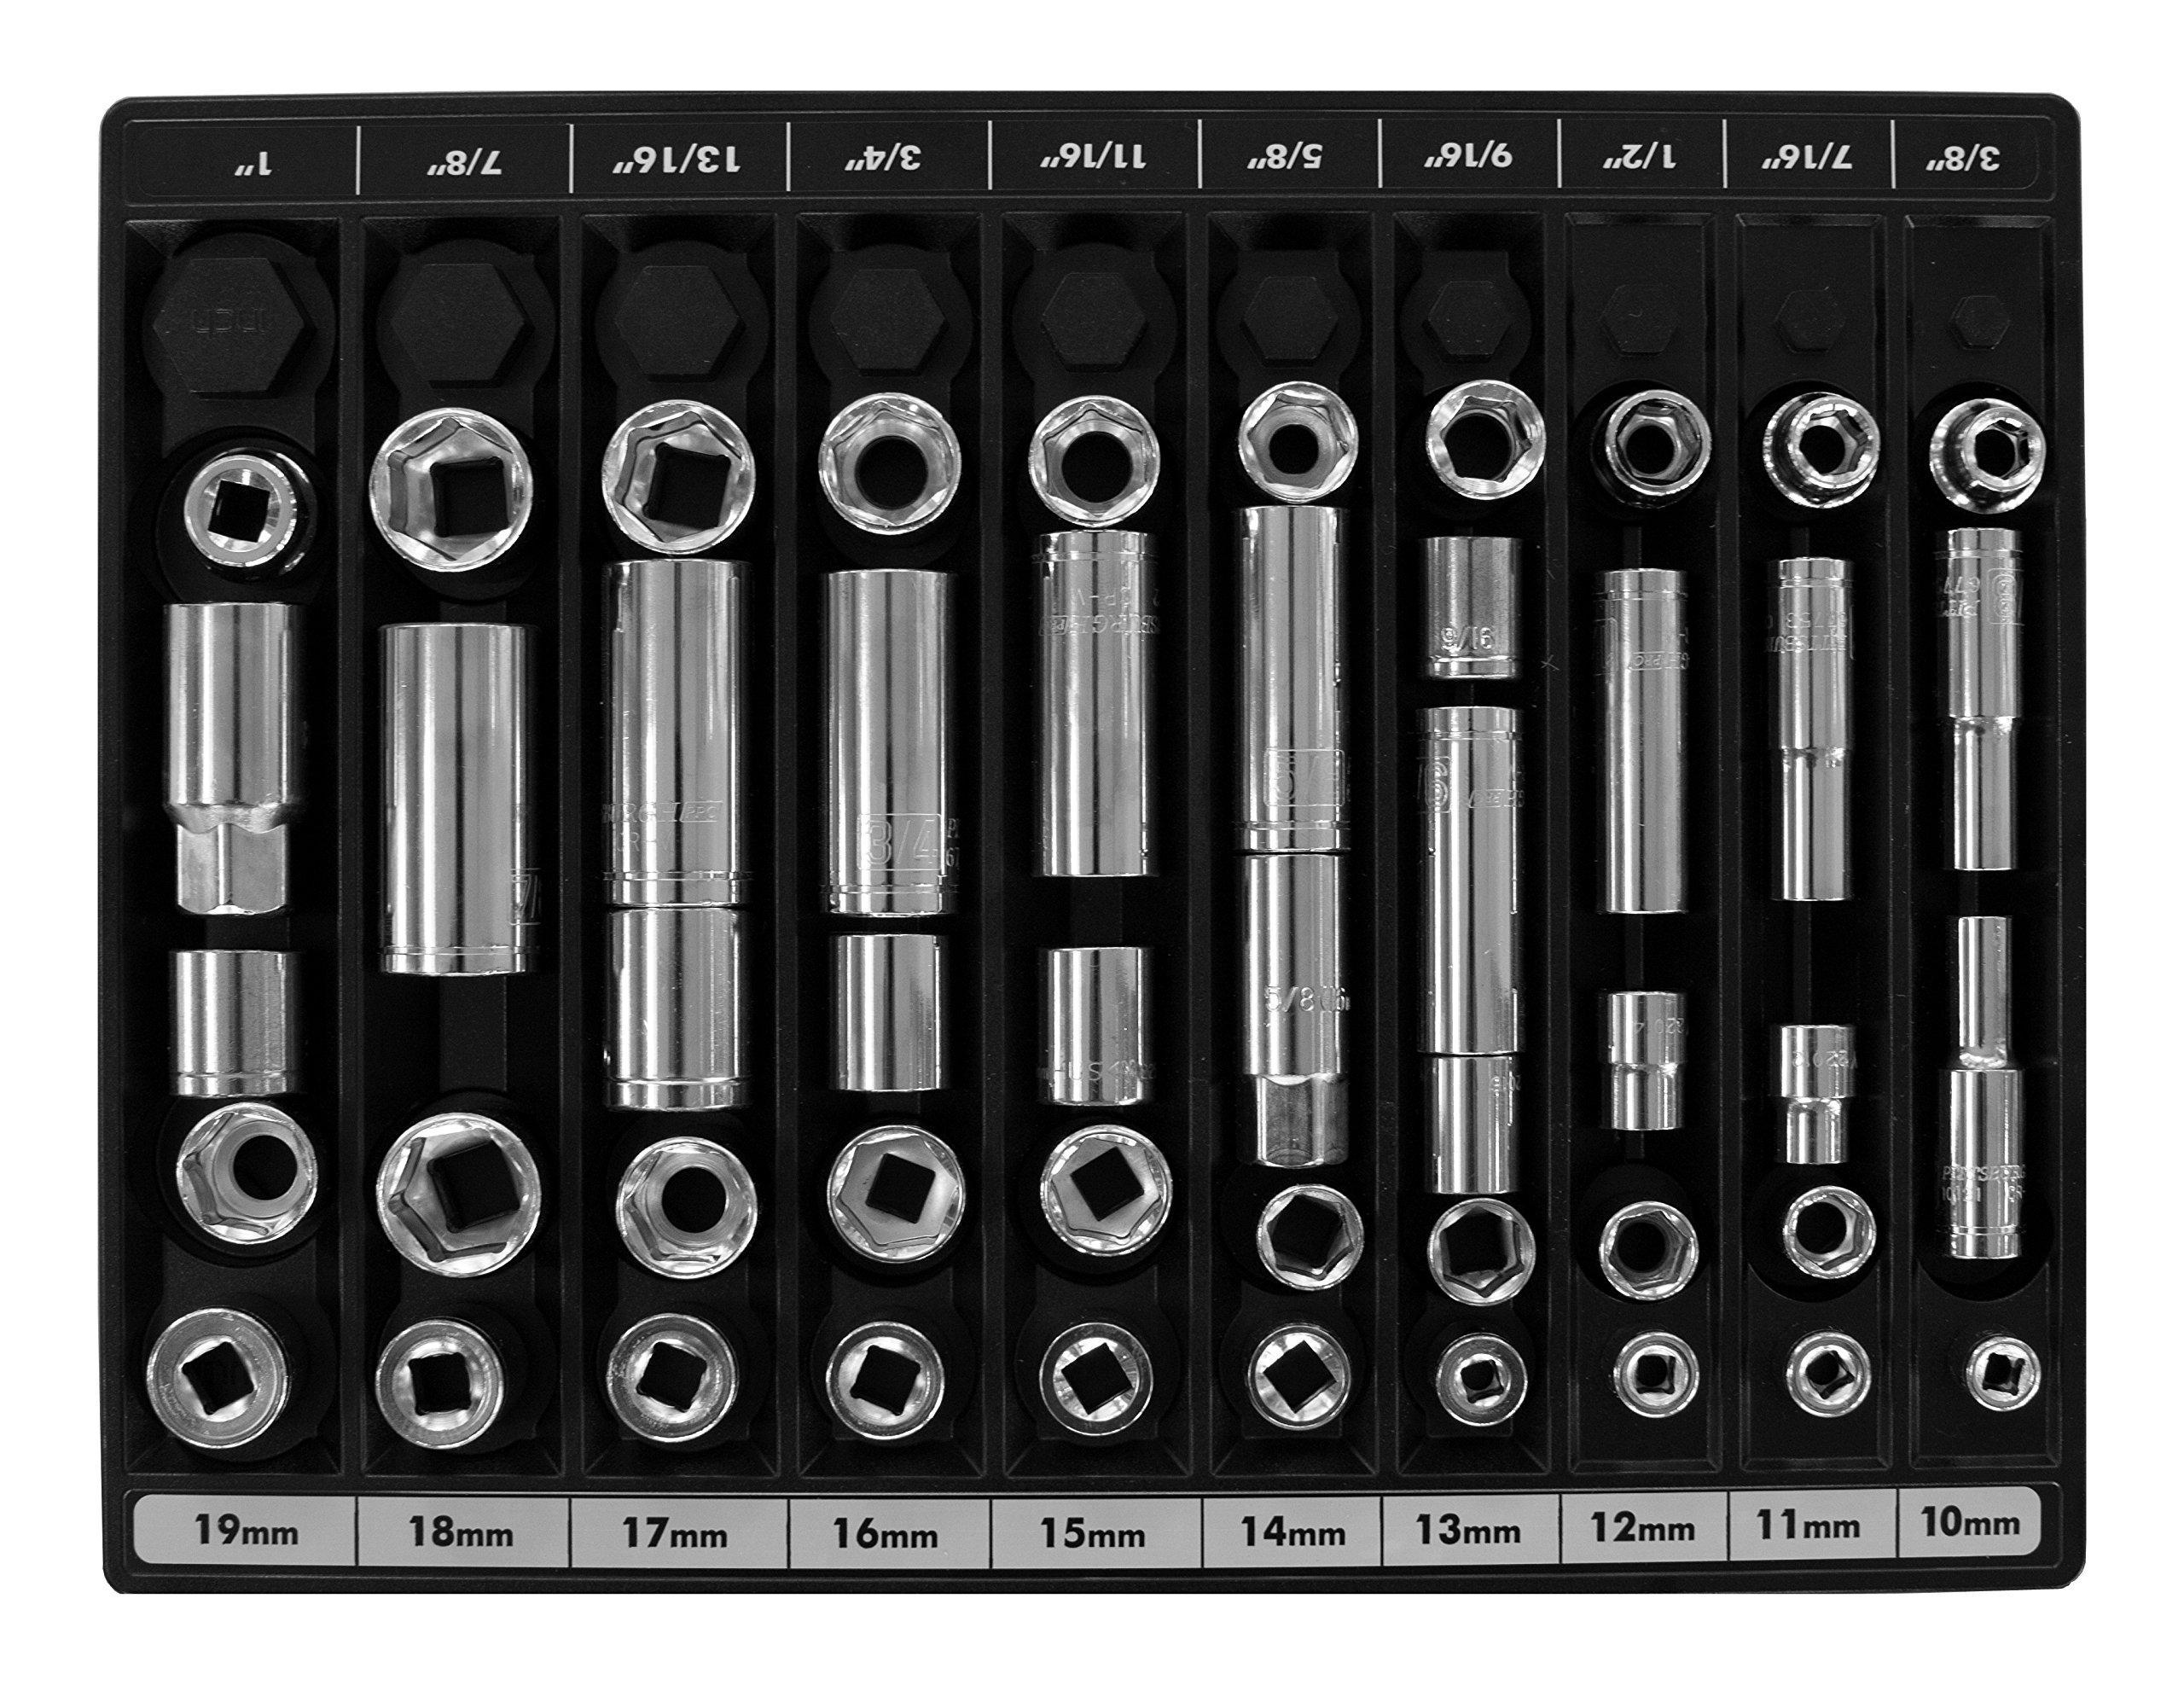 Tool Sorter Socket Organizer - Black by Tool Sorter (Image #9)